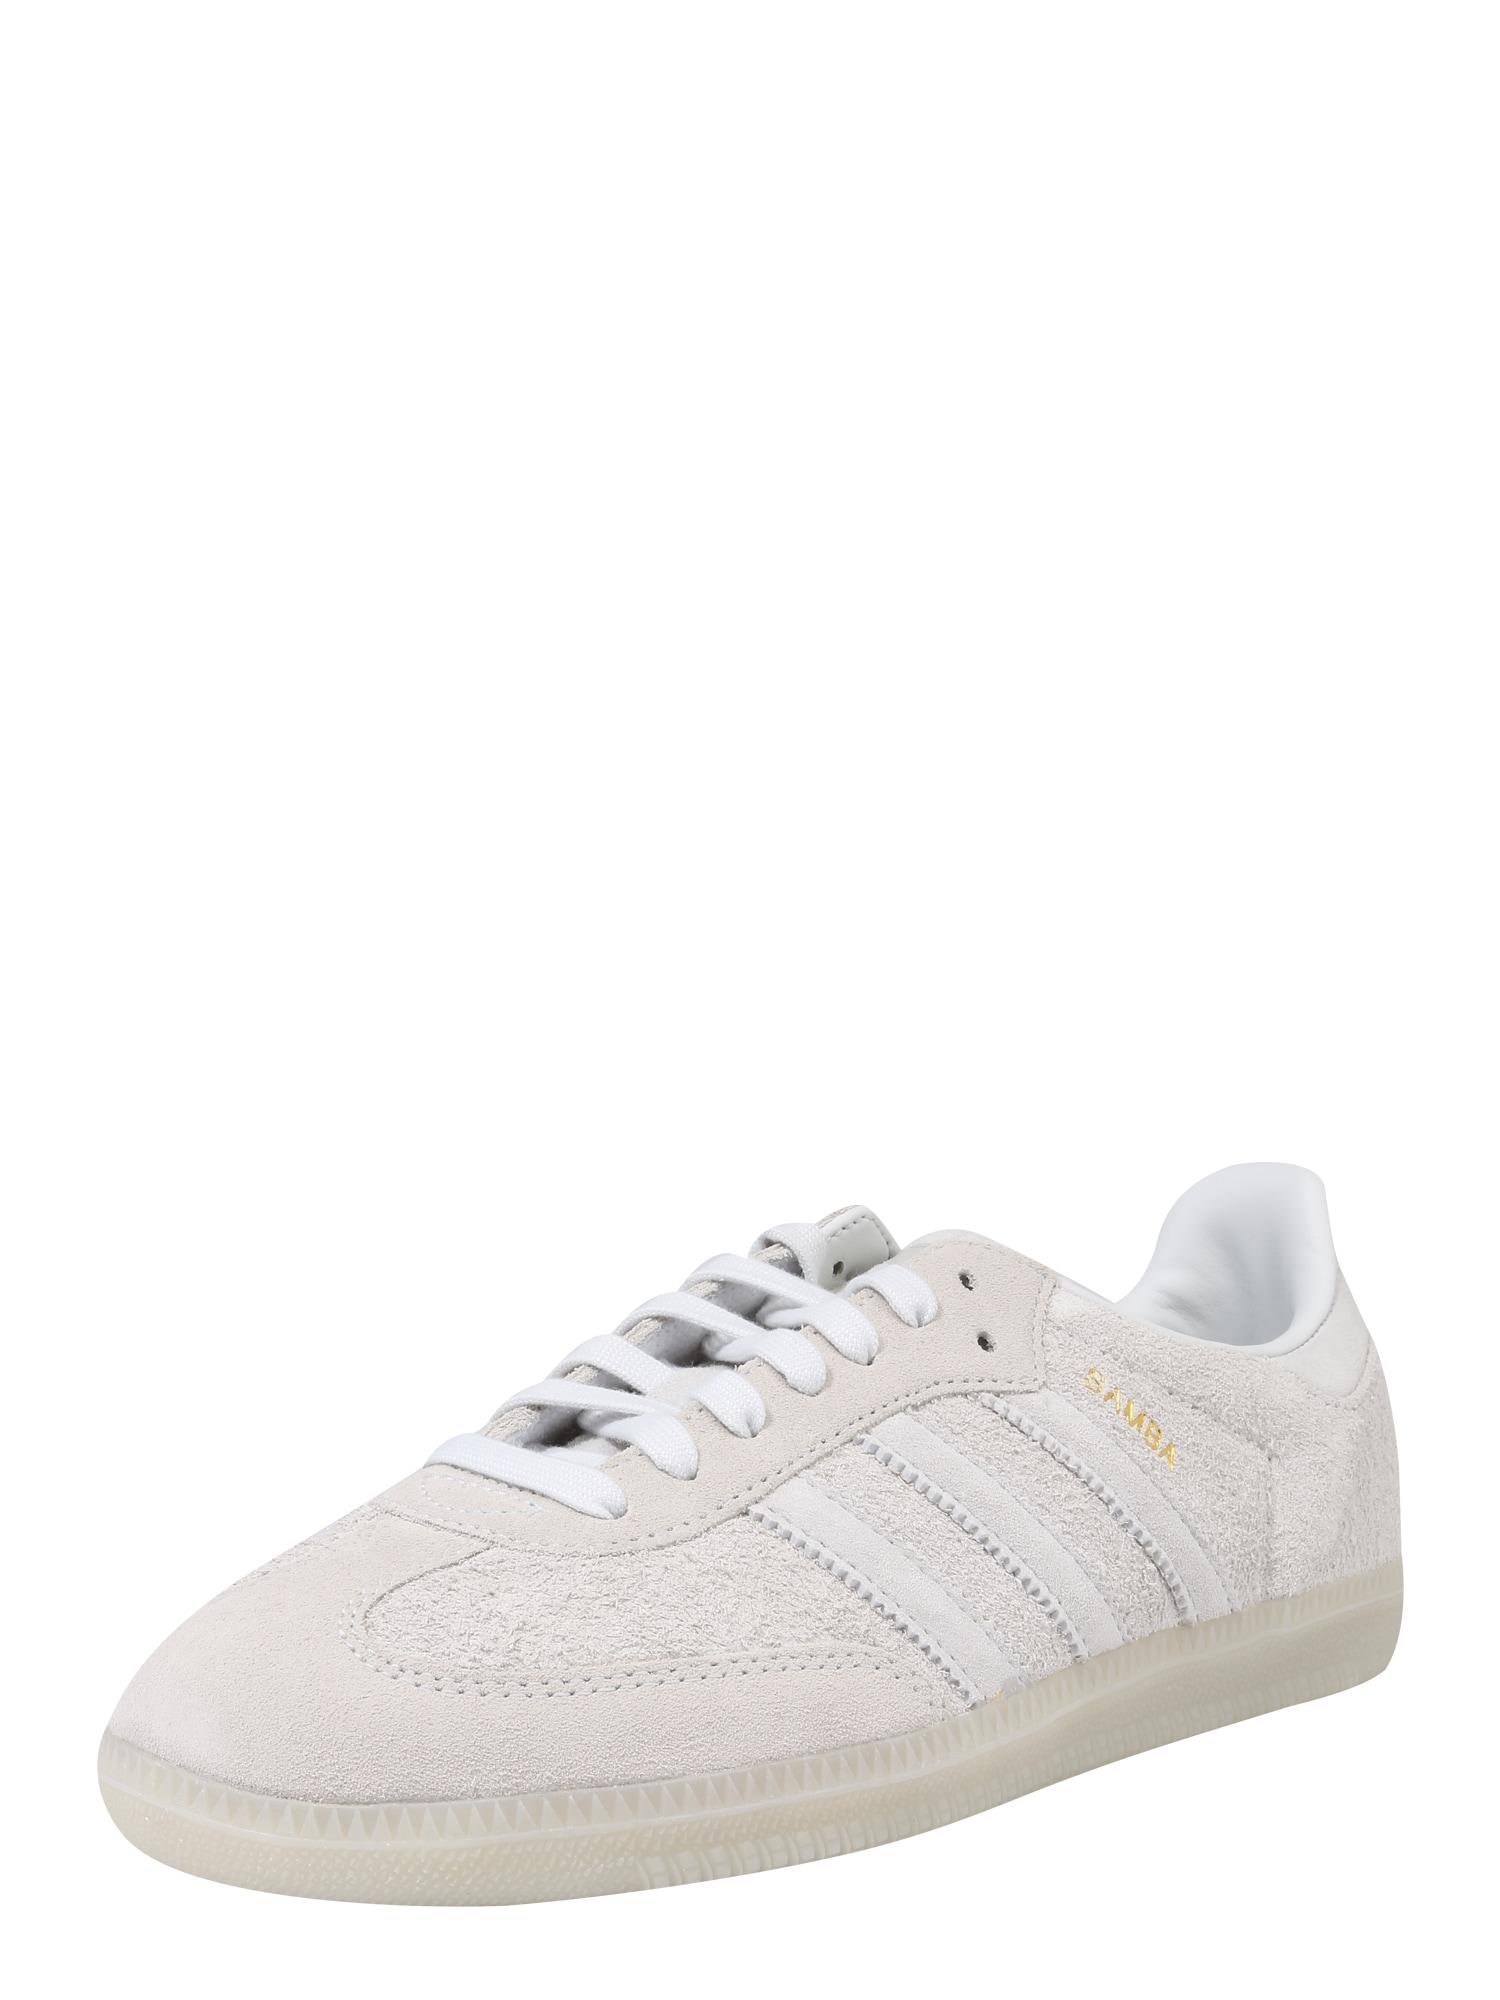 ADIDAS ORIGINALS, Heren Sneakers laag 'SAMBA', natuurwit